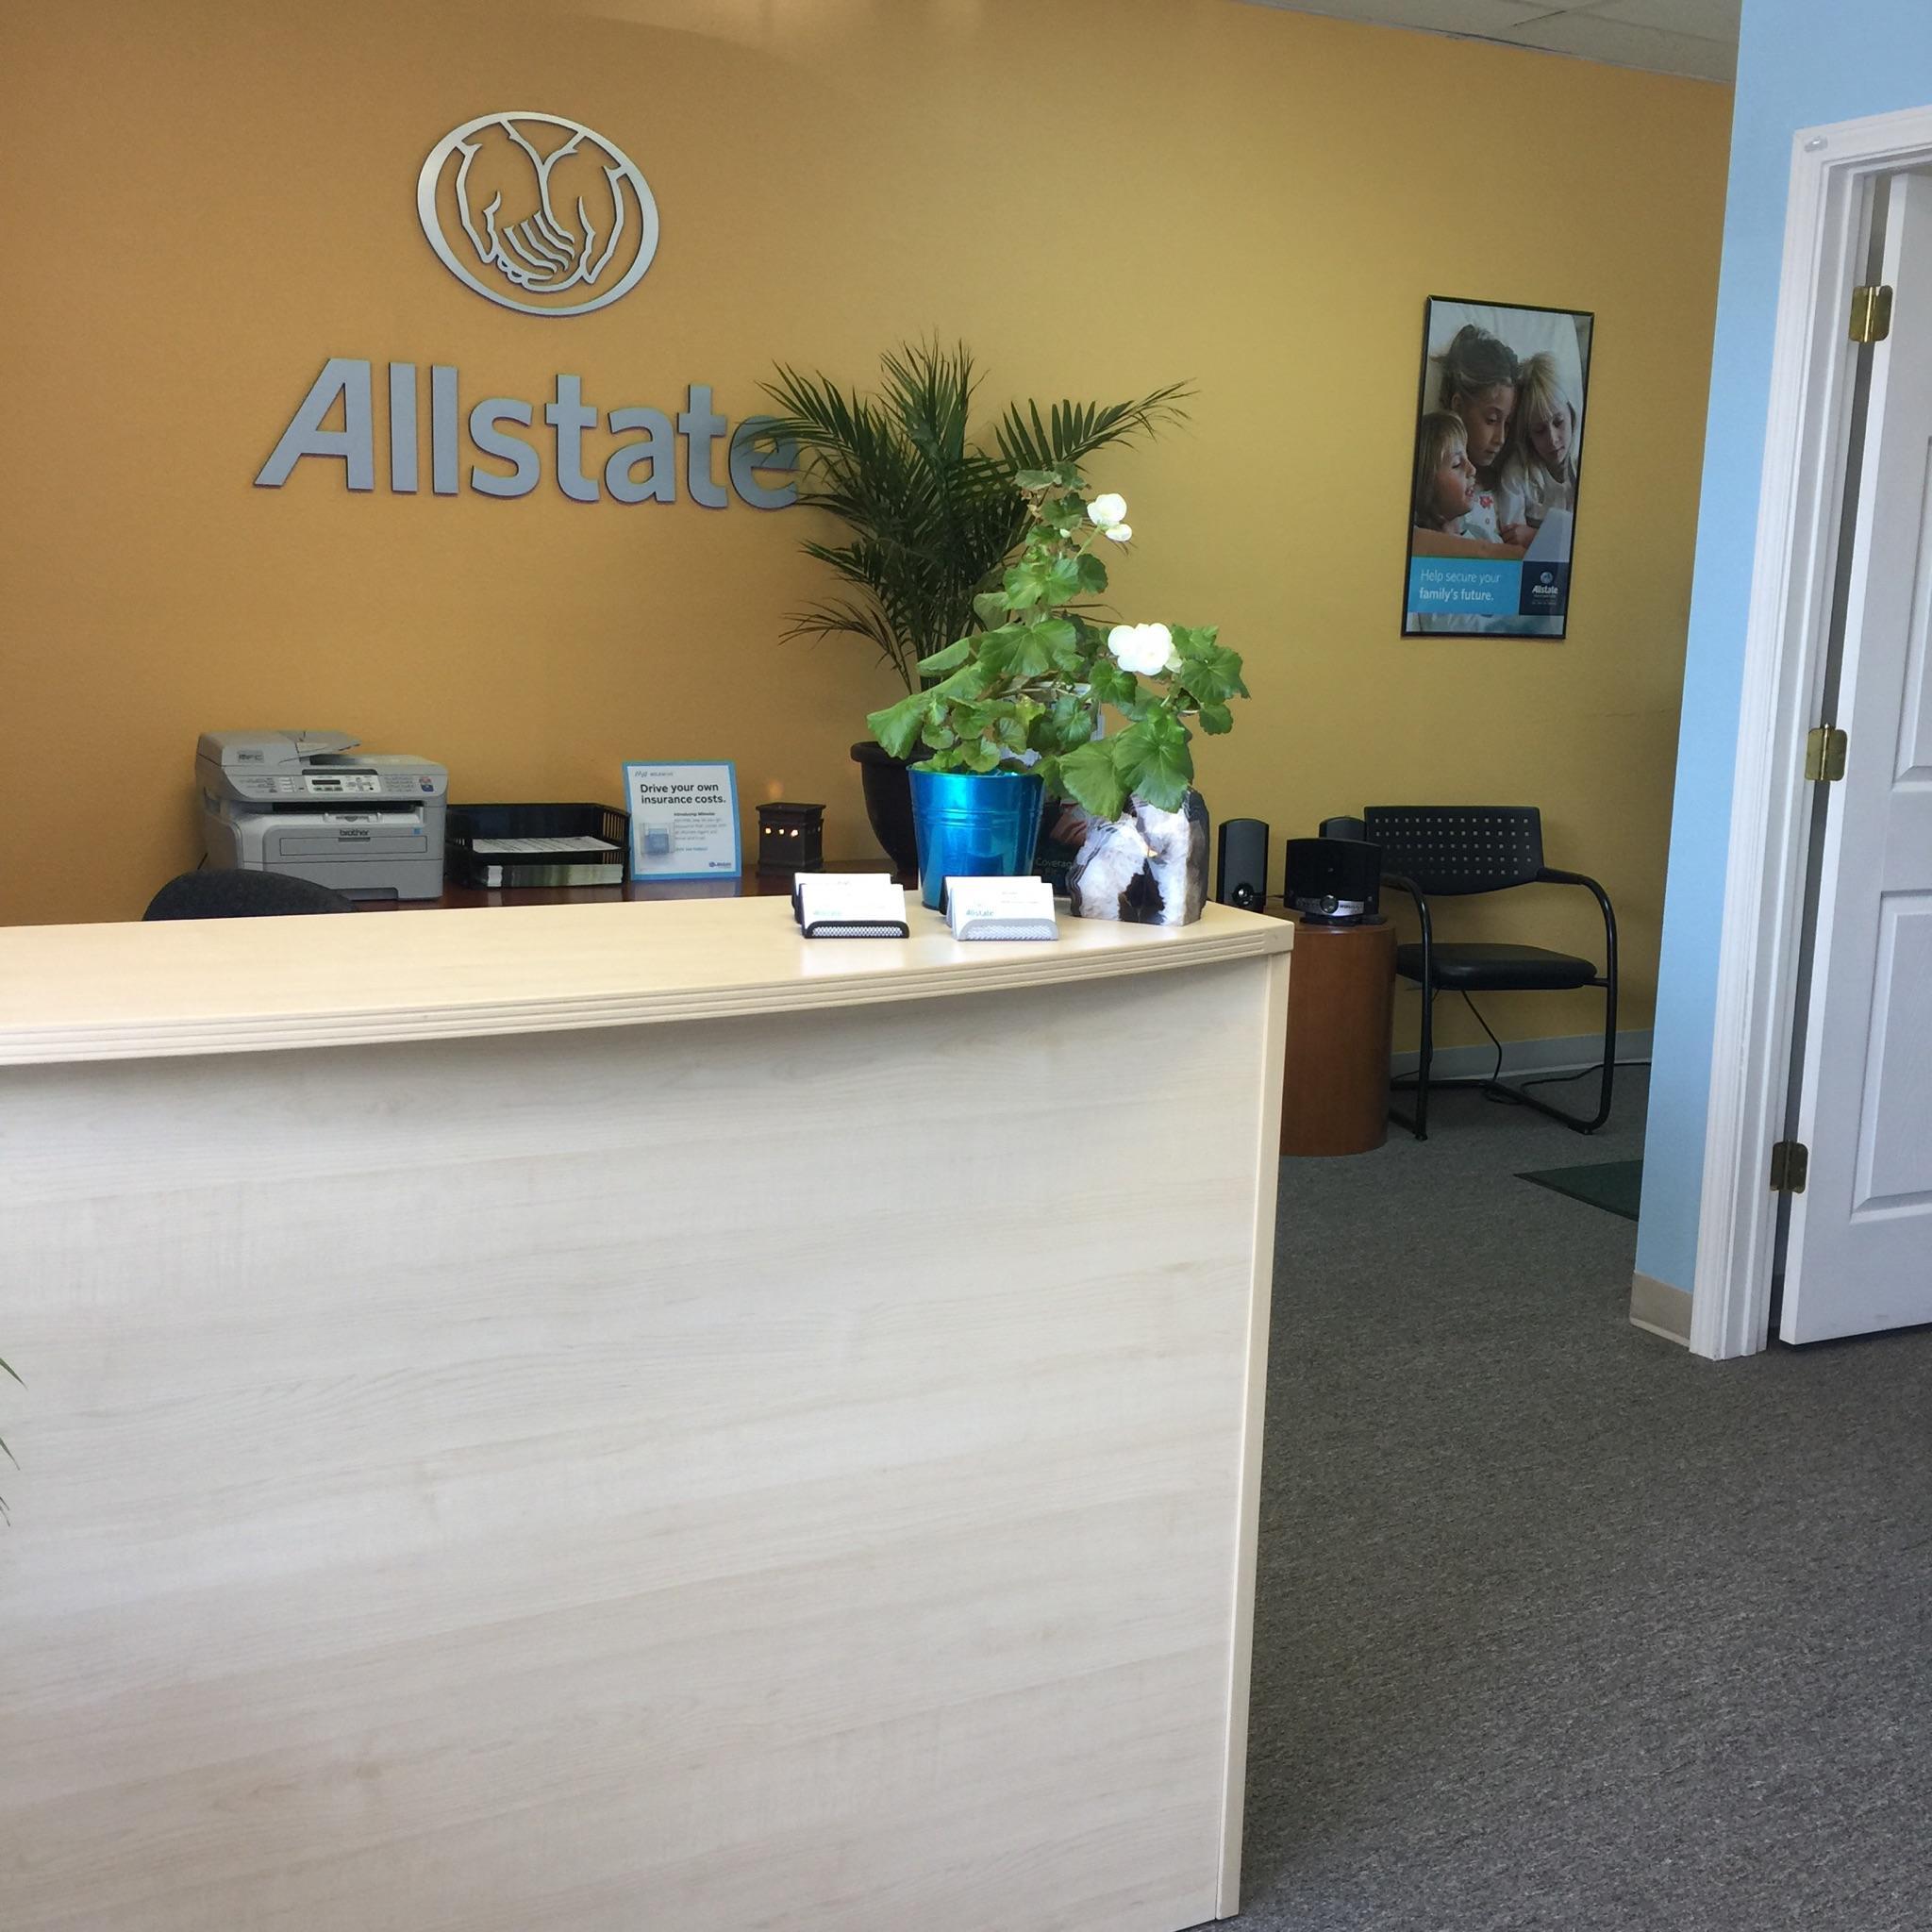 Allstate Insurance Agent: Claire Roshak image 4